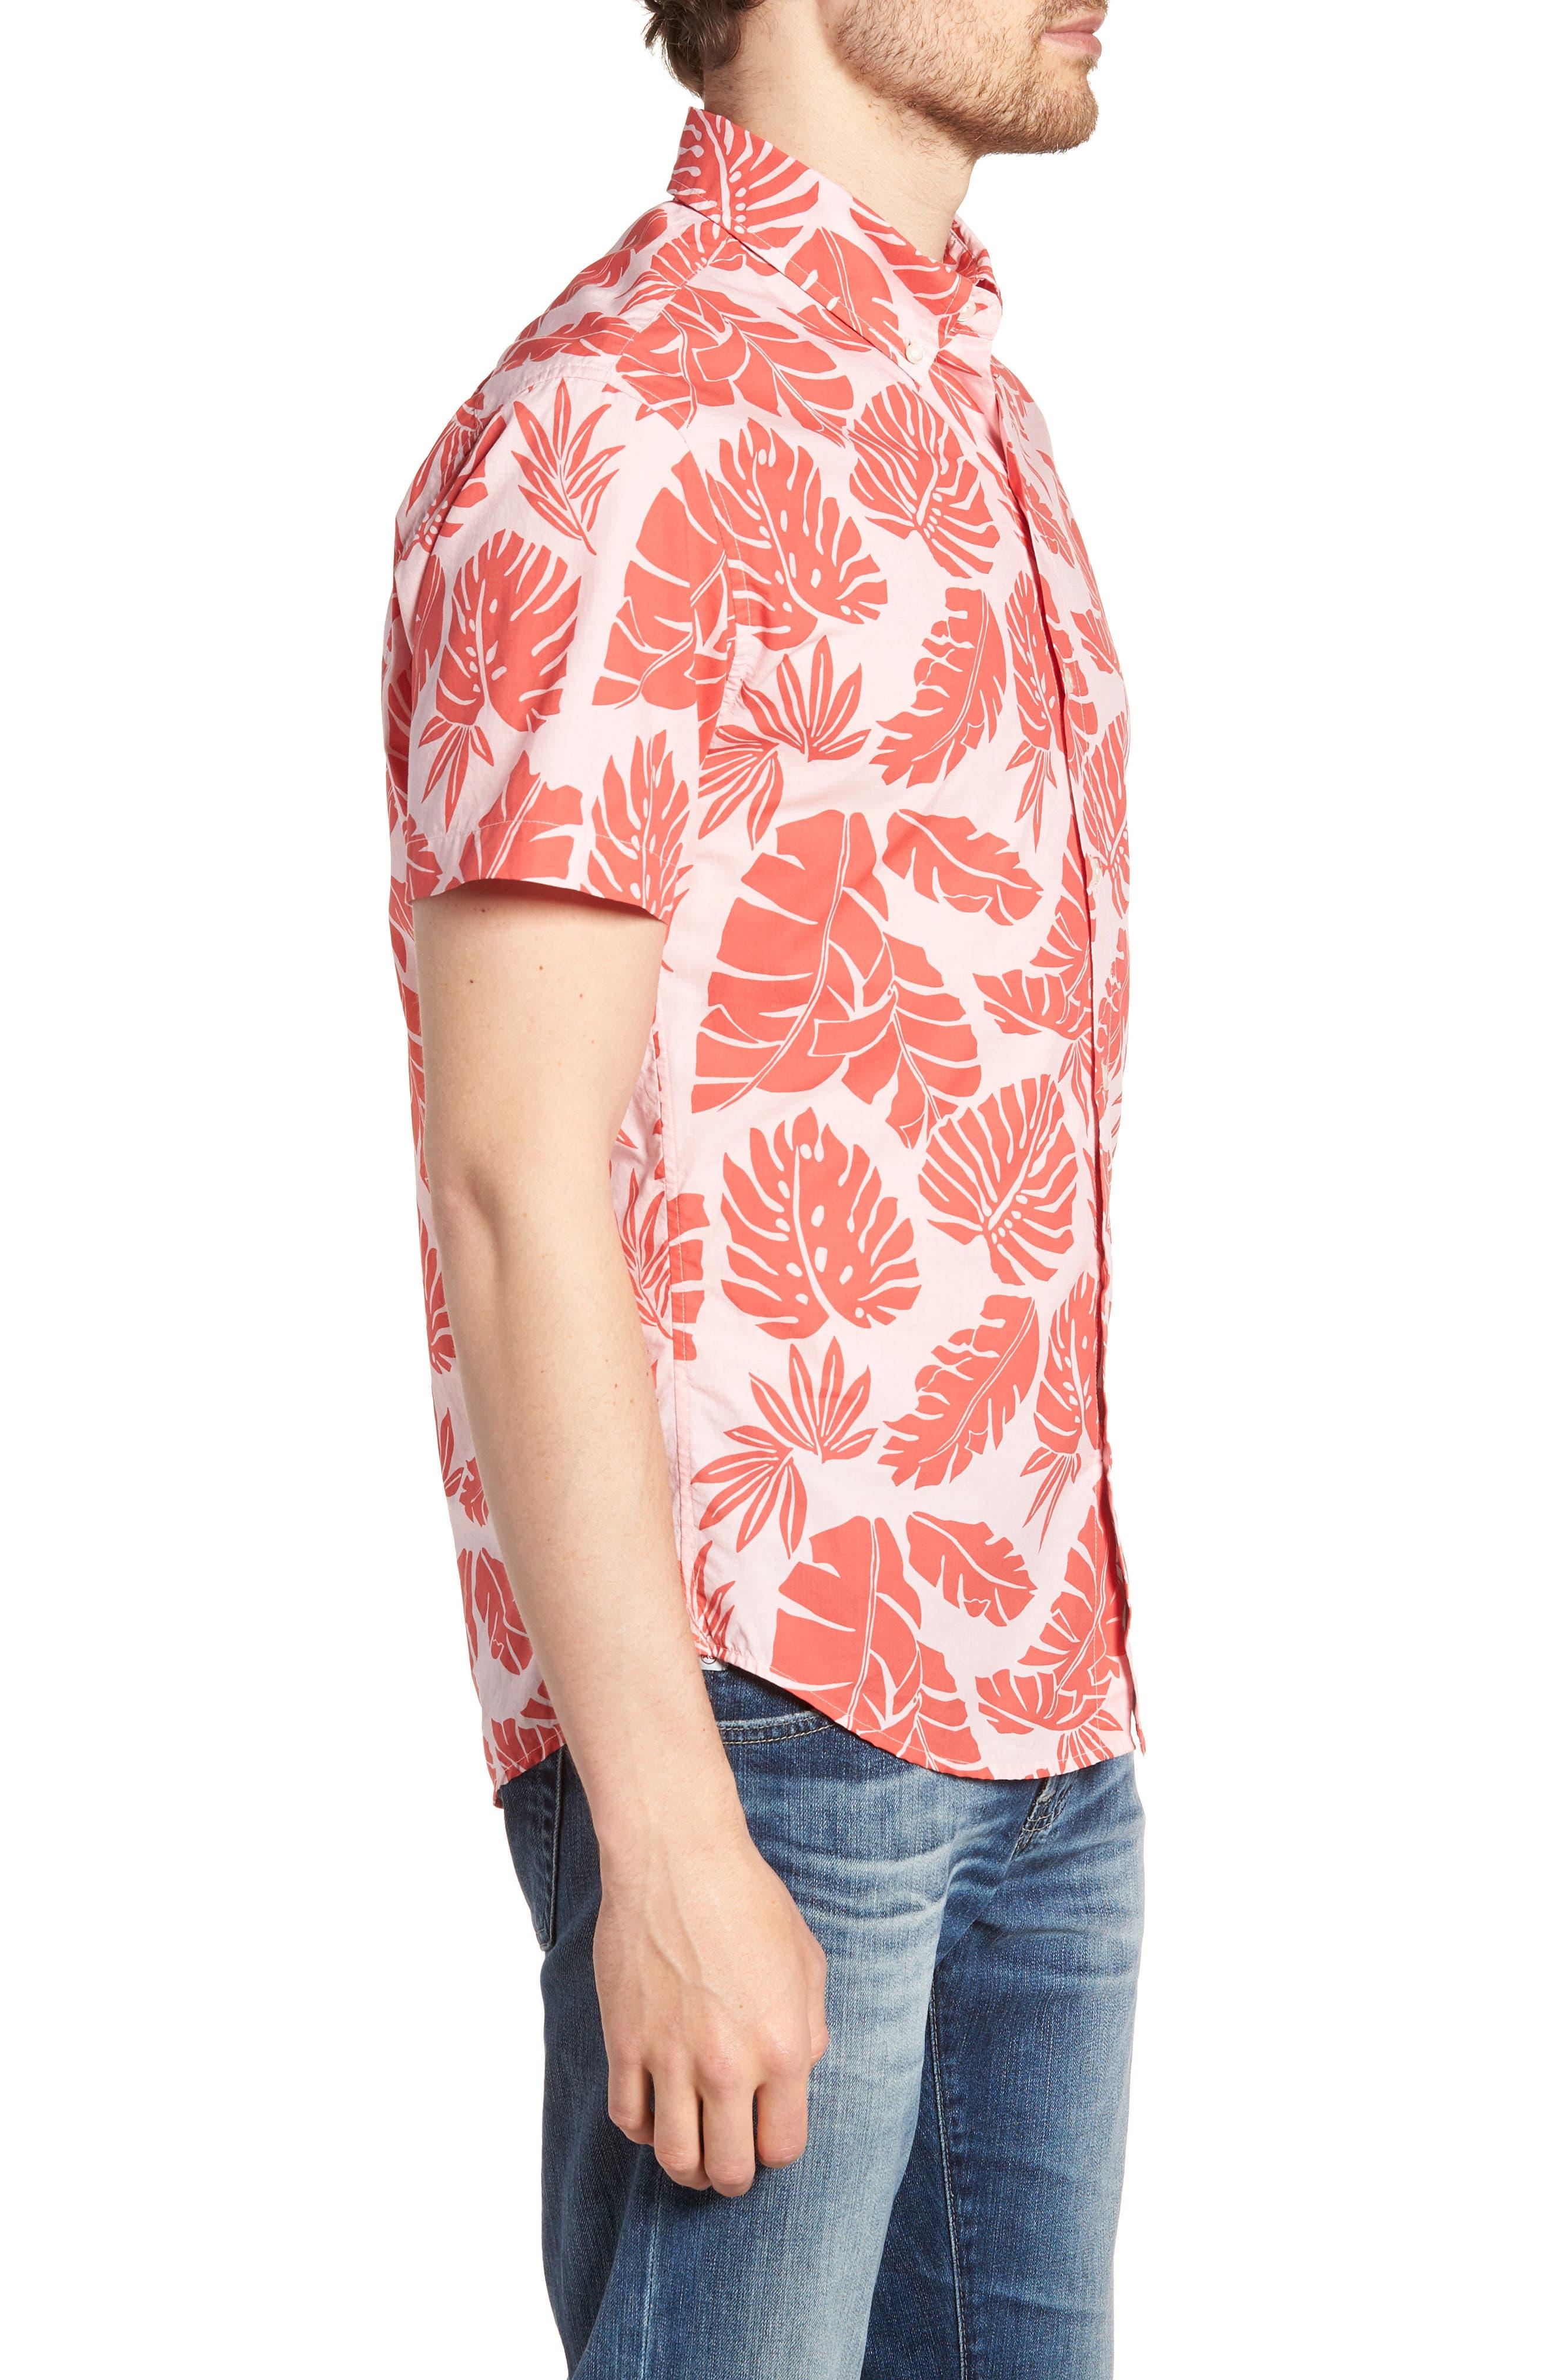 Riviera Slim Fit Palm Print Sport Shirt,                             Alternate thumbnail 3, color,                             PALM SCATTER - CORAL FAN